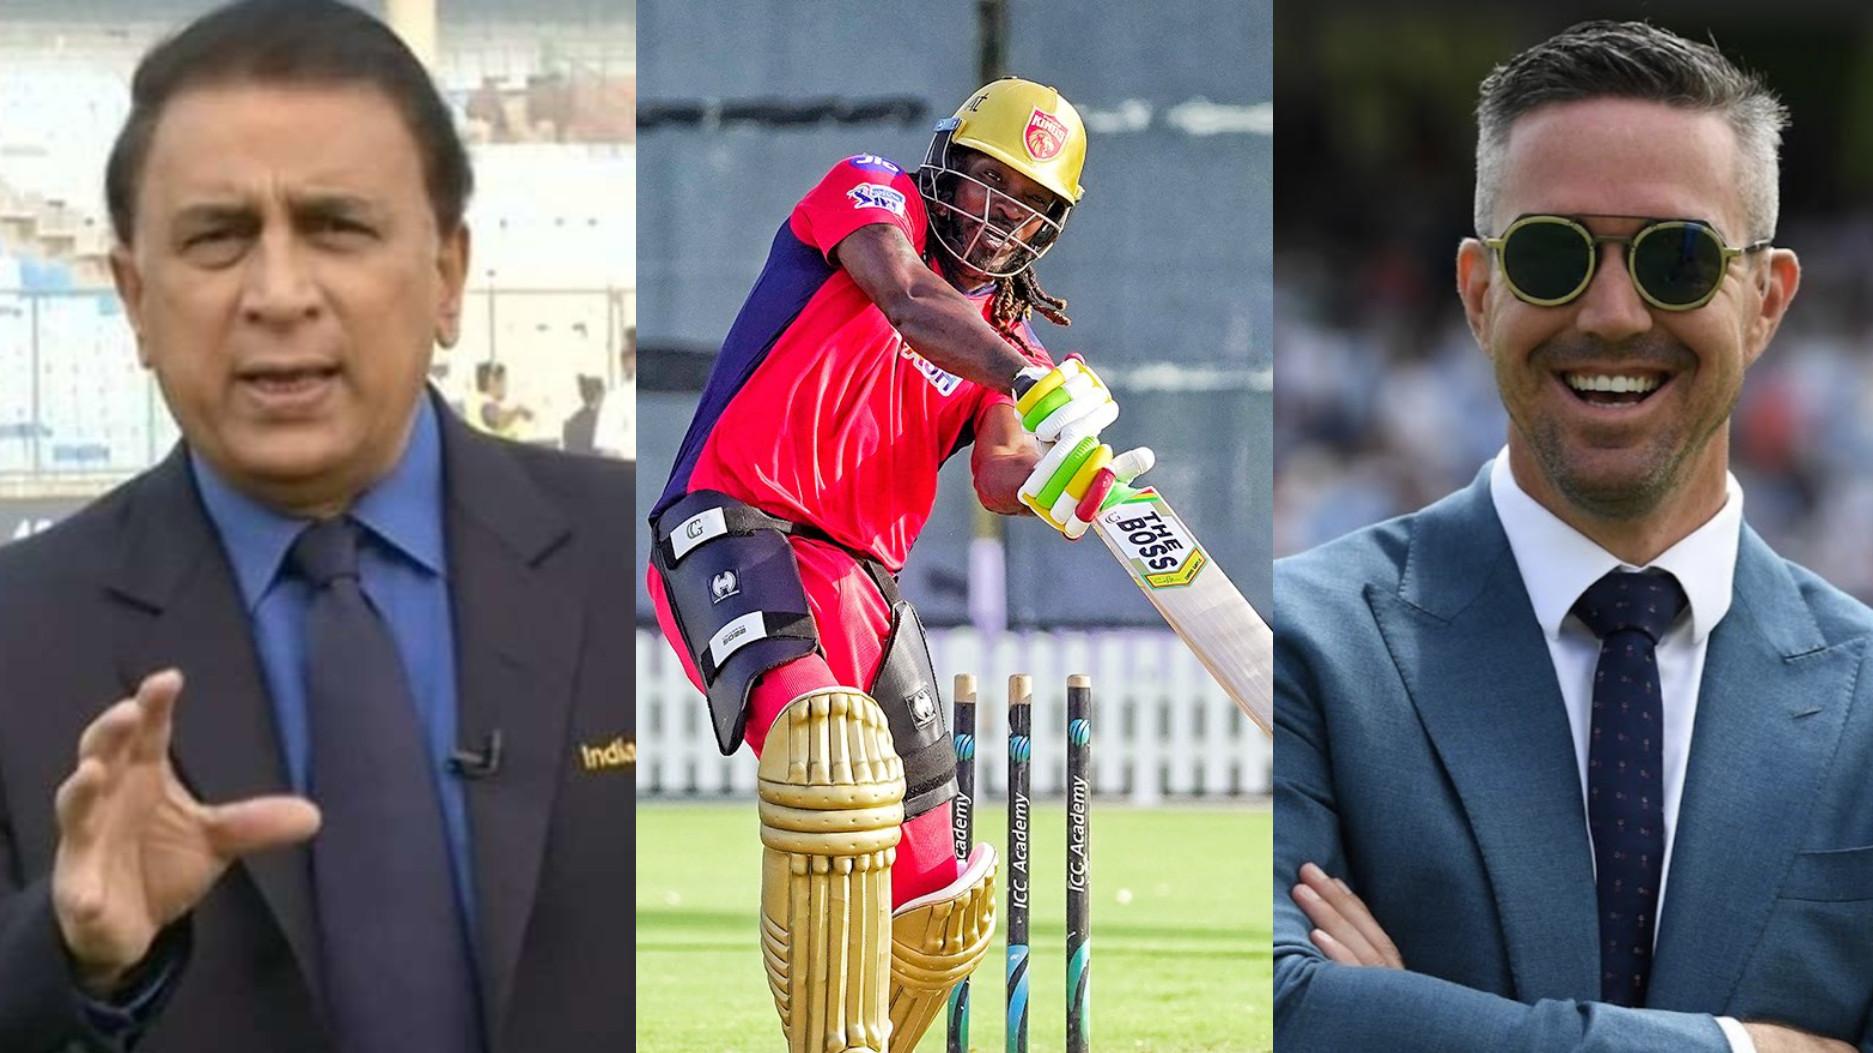 IPL 2021: Makes zero sense- Gavaskar, Pietersen on Gayle's exclusion from PBKS XI